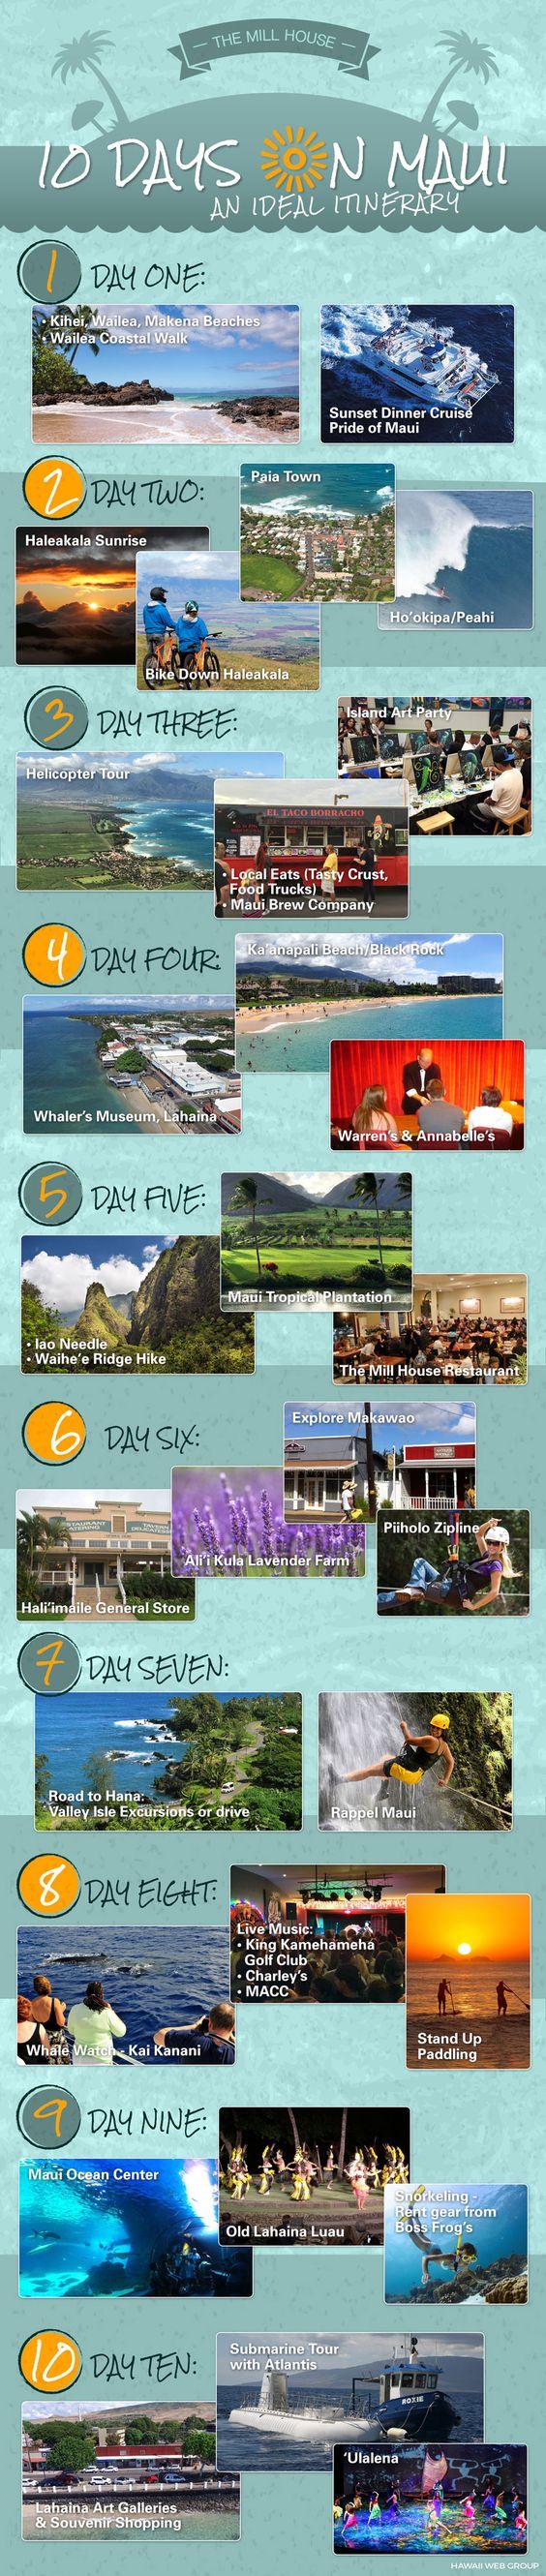 10 Days Maui itinerary                                                                                                                                                      More